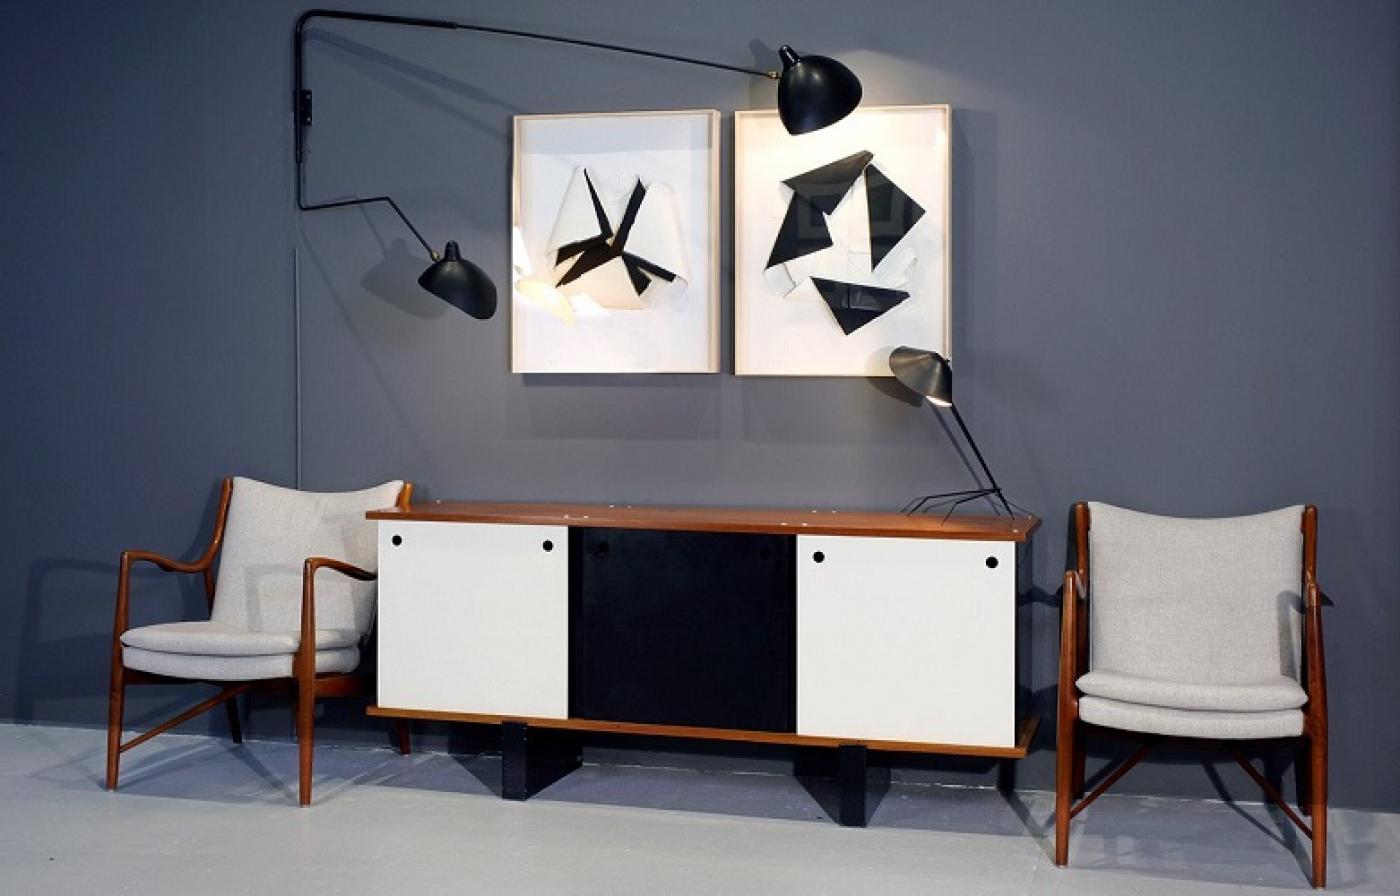 Serge Mouille Originals Show Opens at Dobrinka Salzman Gallery